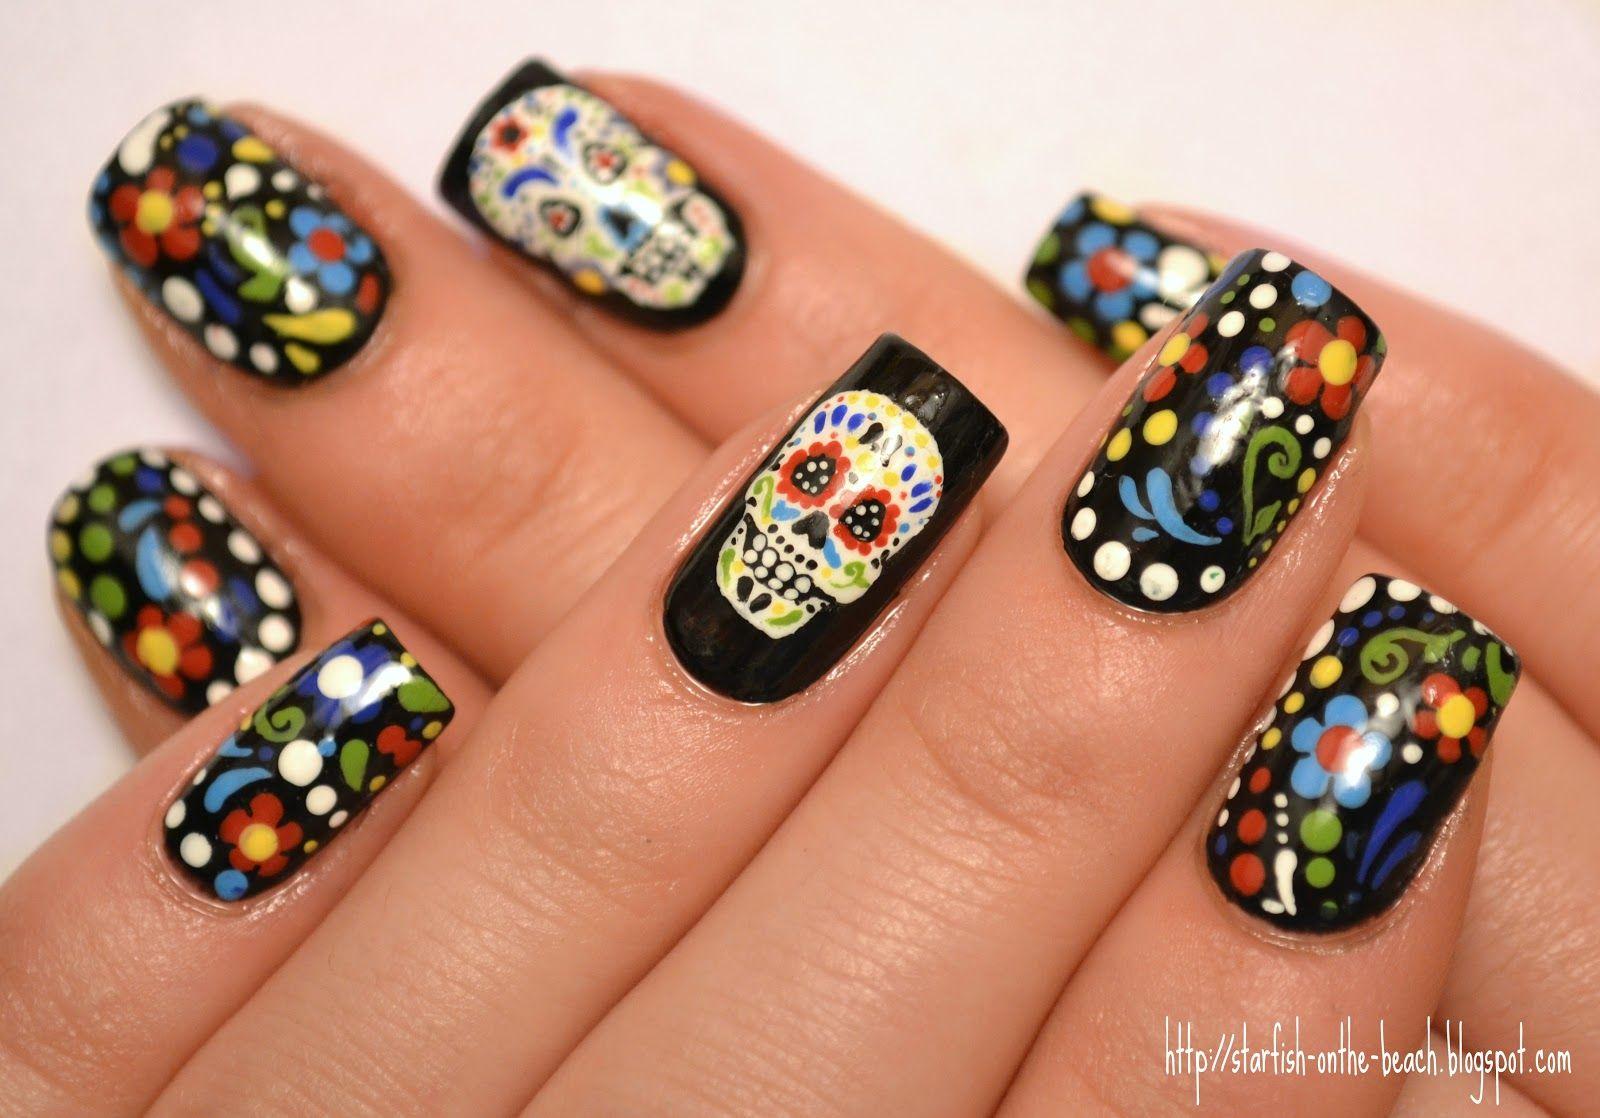 Sugar skull nails, this is dope | makeup | Pinterest | Sugar skull ...